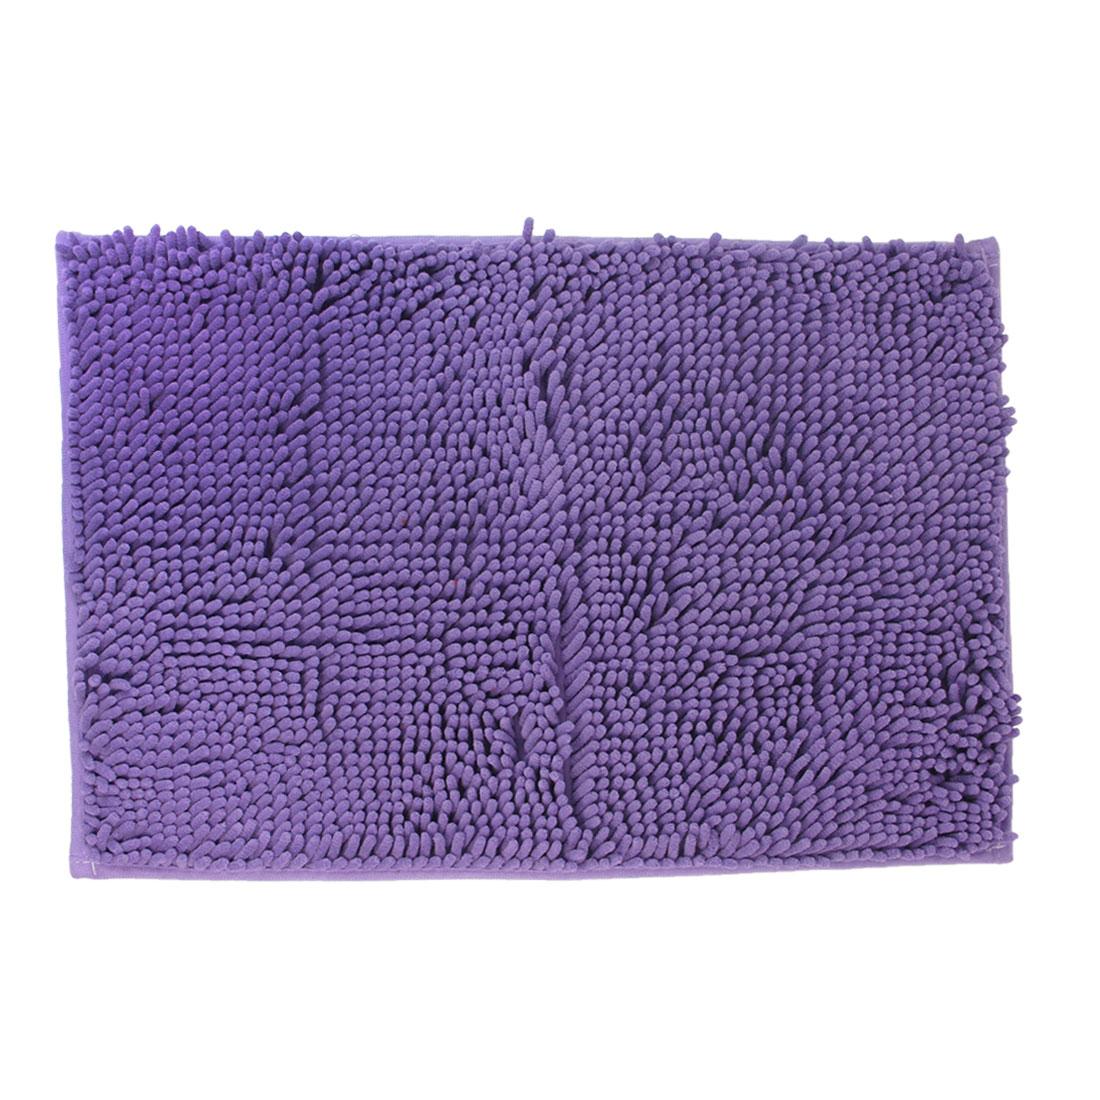 Bedroom Hallway Purple Rectangle Shaped Nonslip Mat Area Rug Carpet 40cm x 60cm